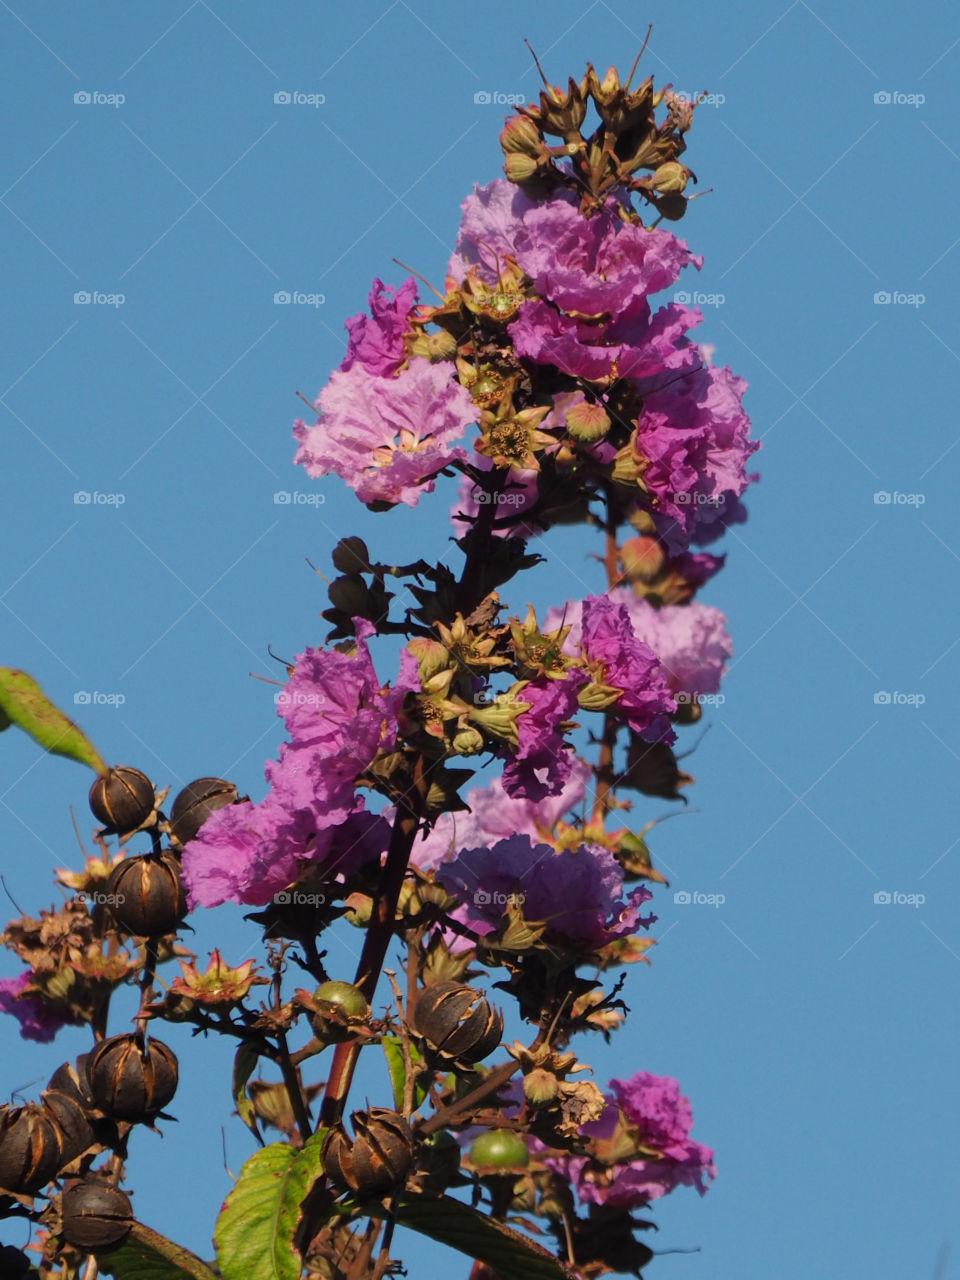 Summer Bloom Crape Myrtle Tree. Purple summer blooming flowers on Queen's Crape Myrtle Tree